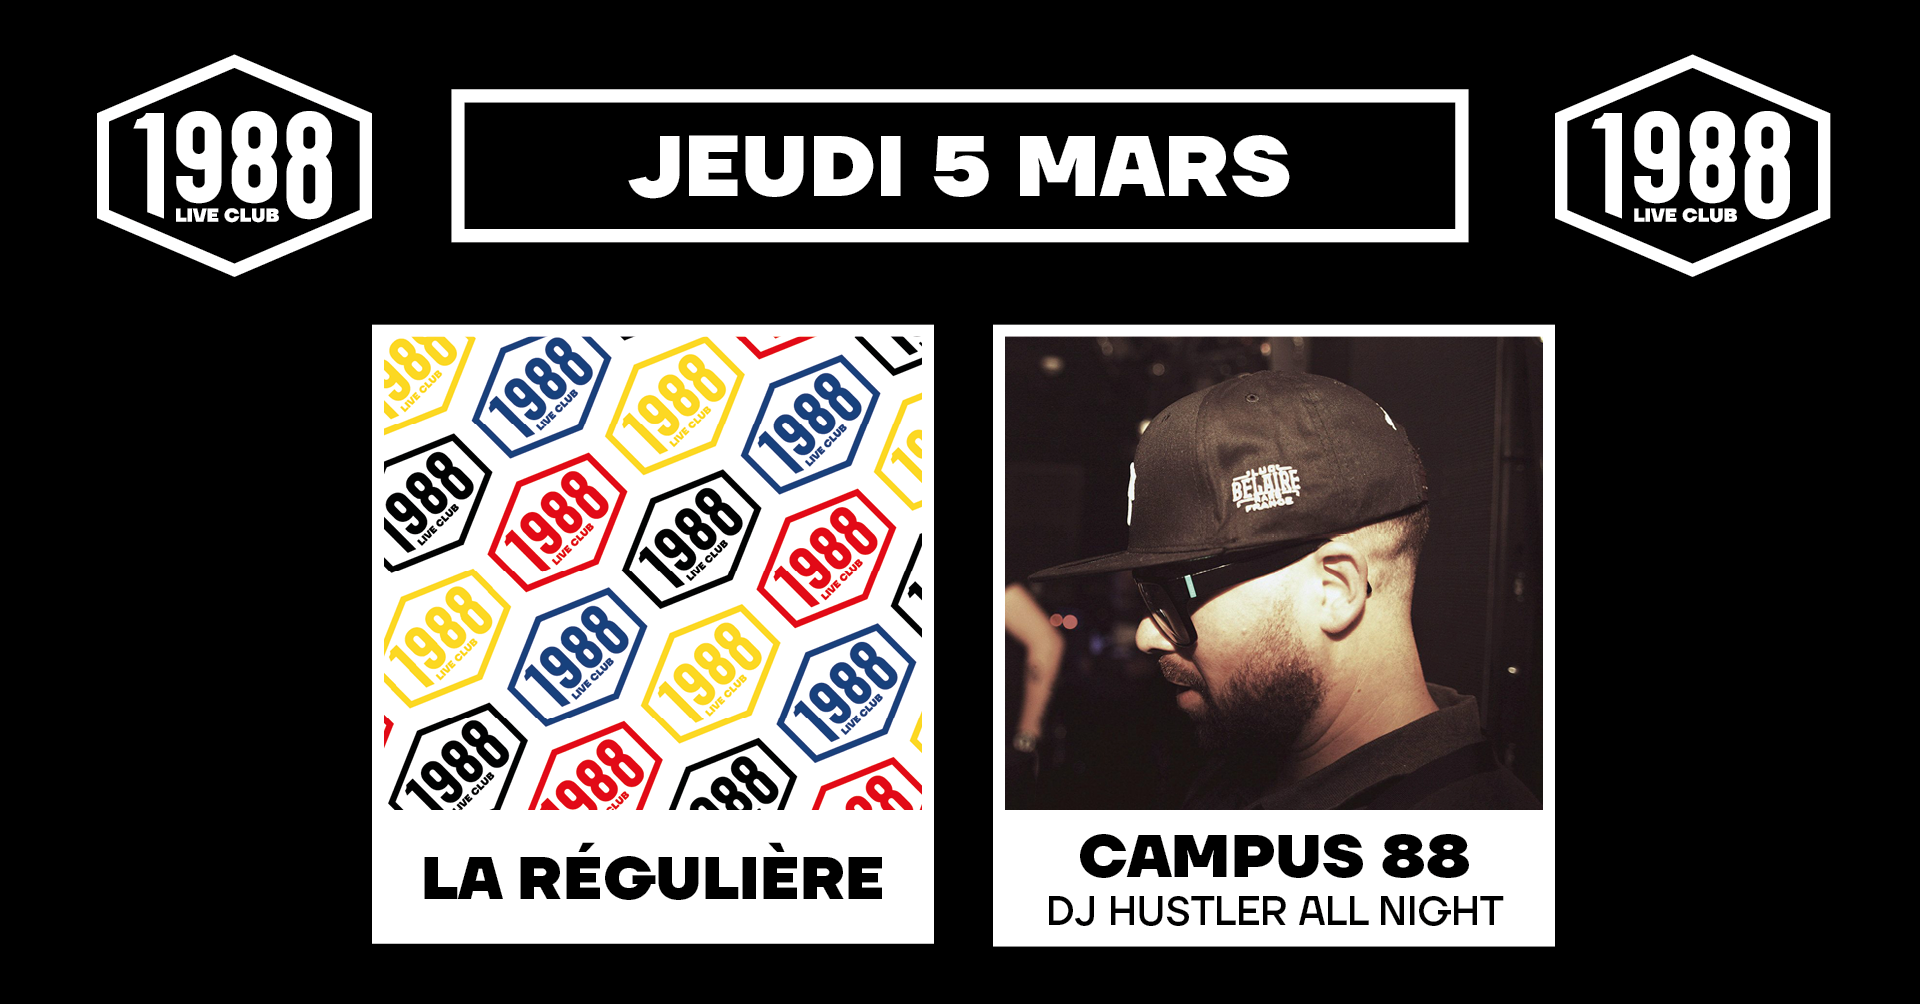 JEU. 5 MARS